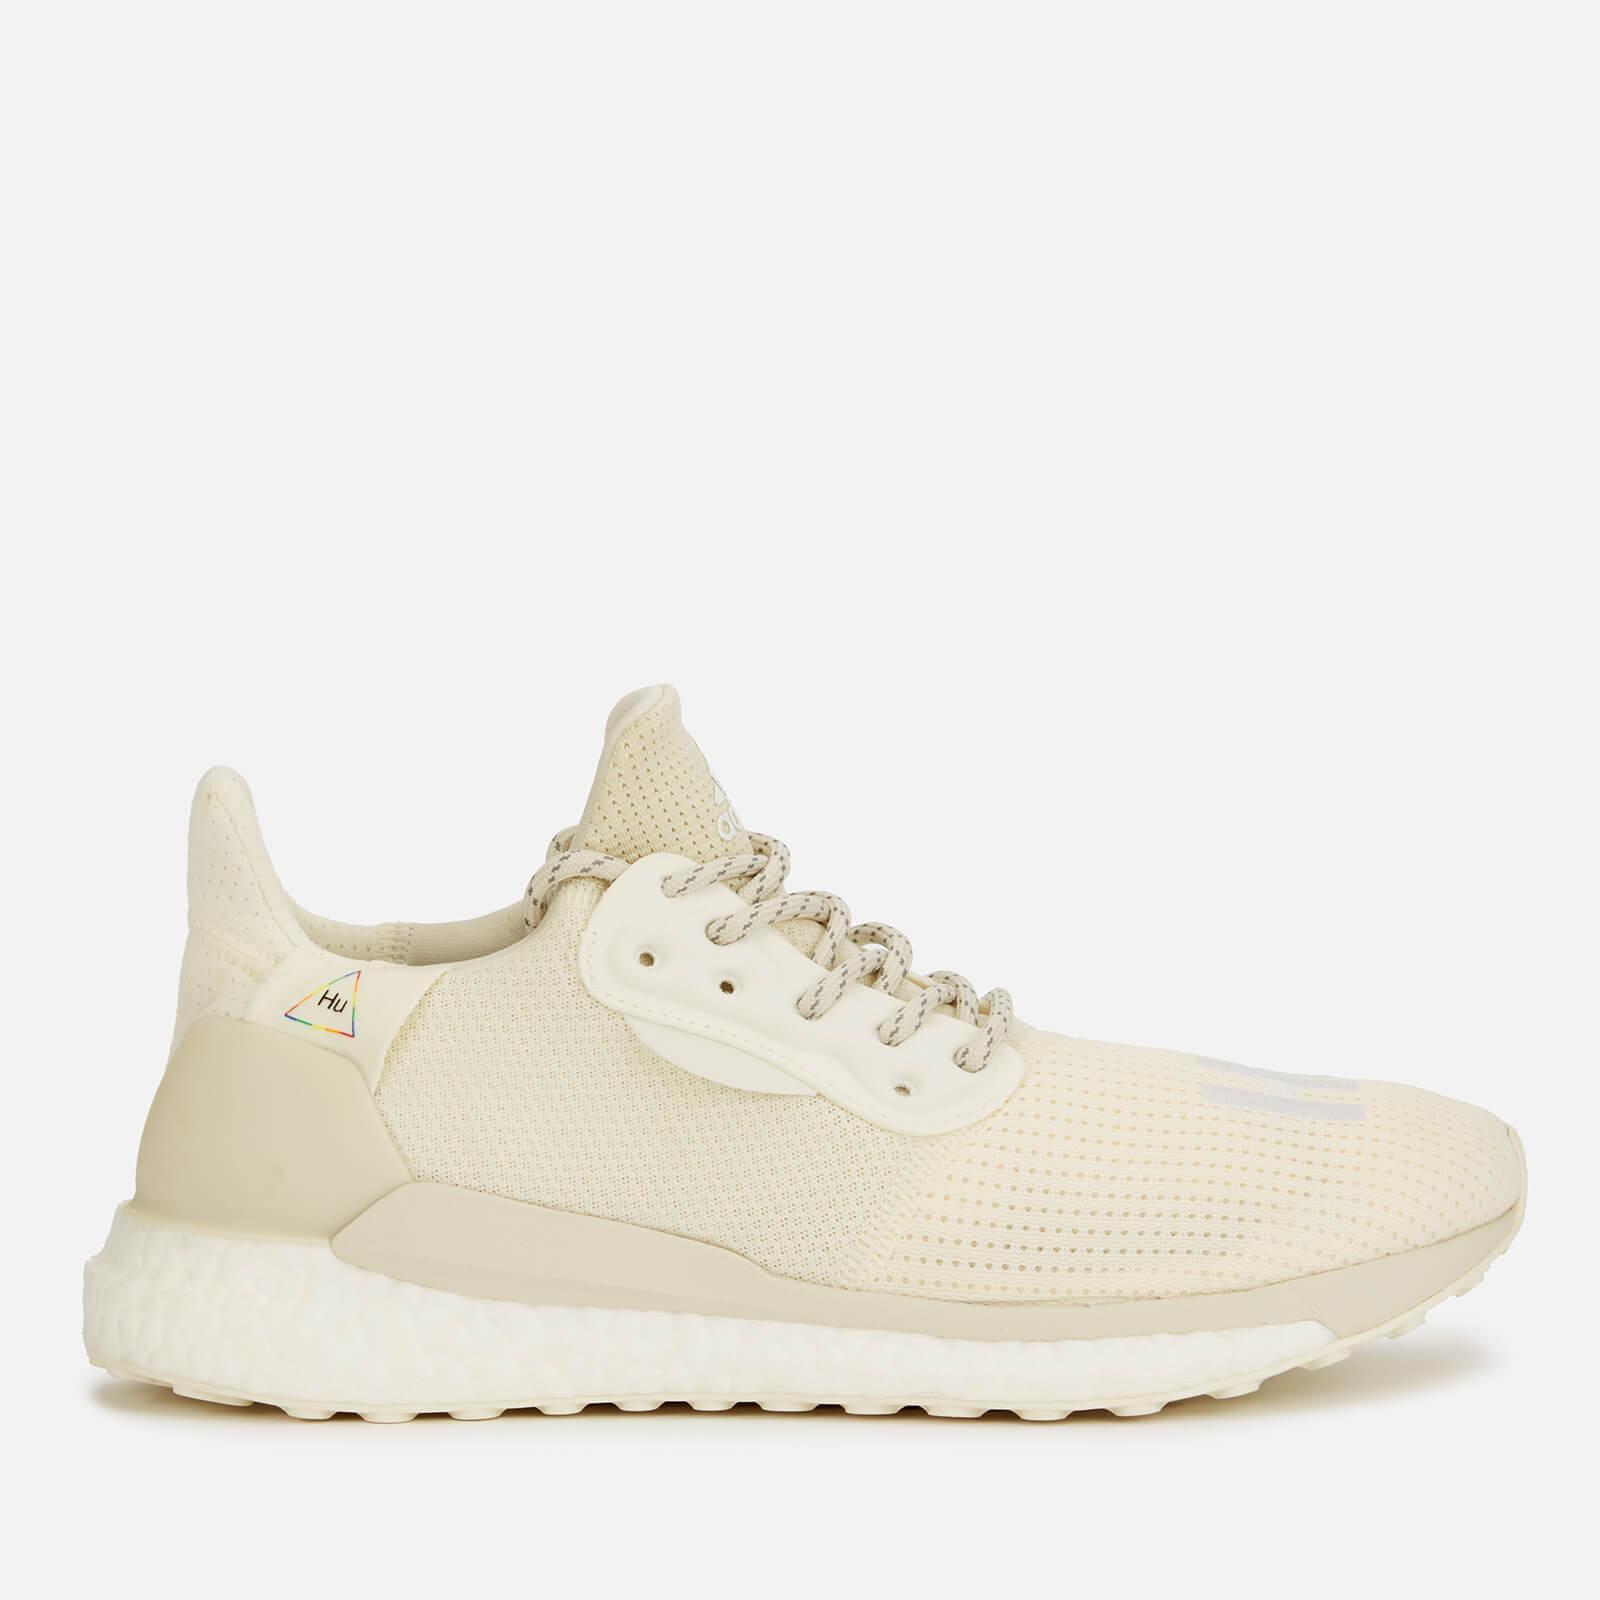 competitive price 0dd1b 6db3c adidas X Pharrell Williams Men's Solar HU PRD Trainers - Off White